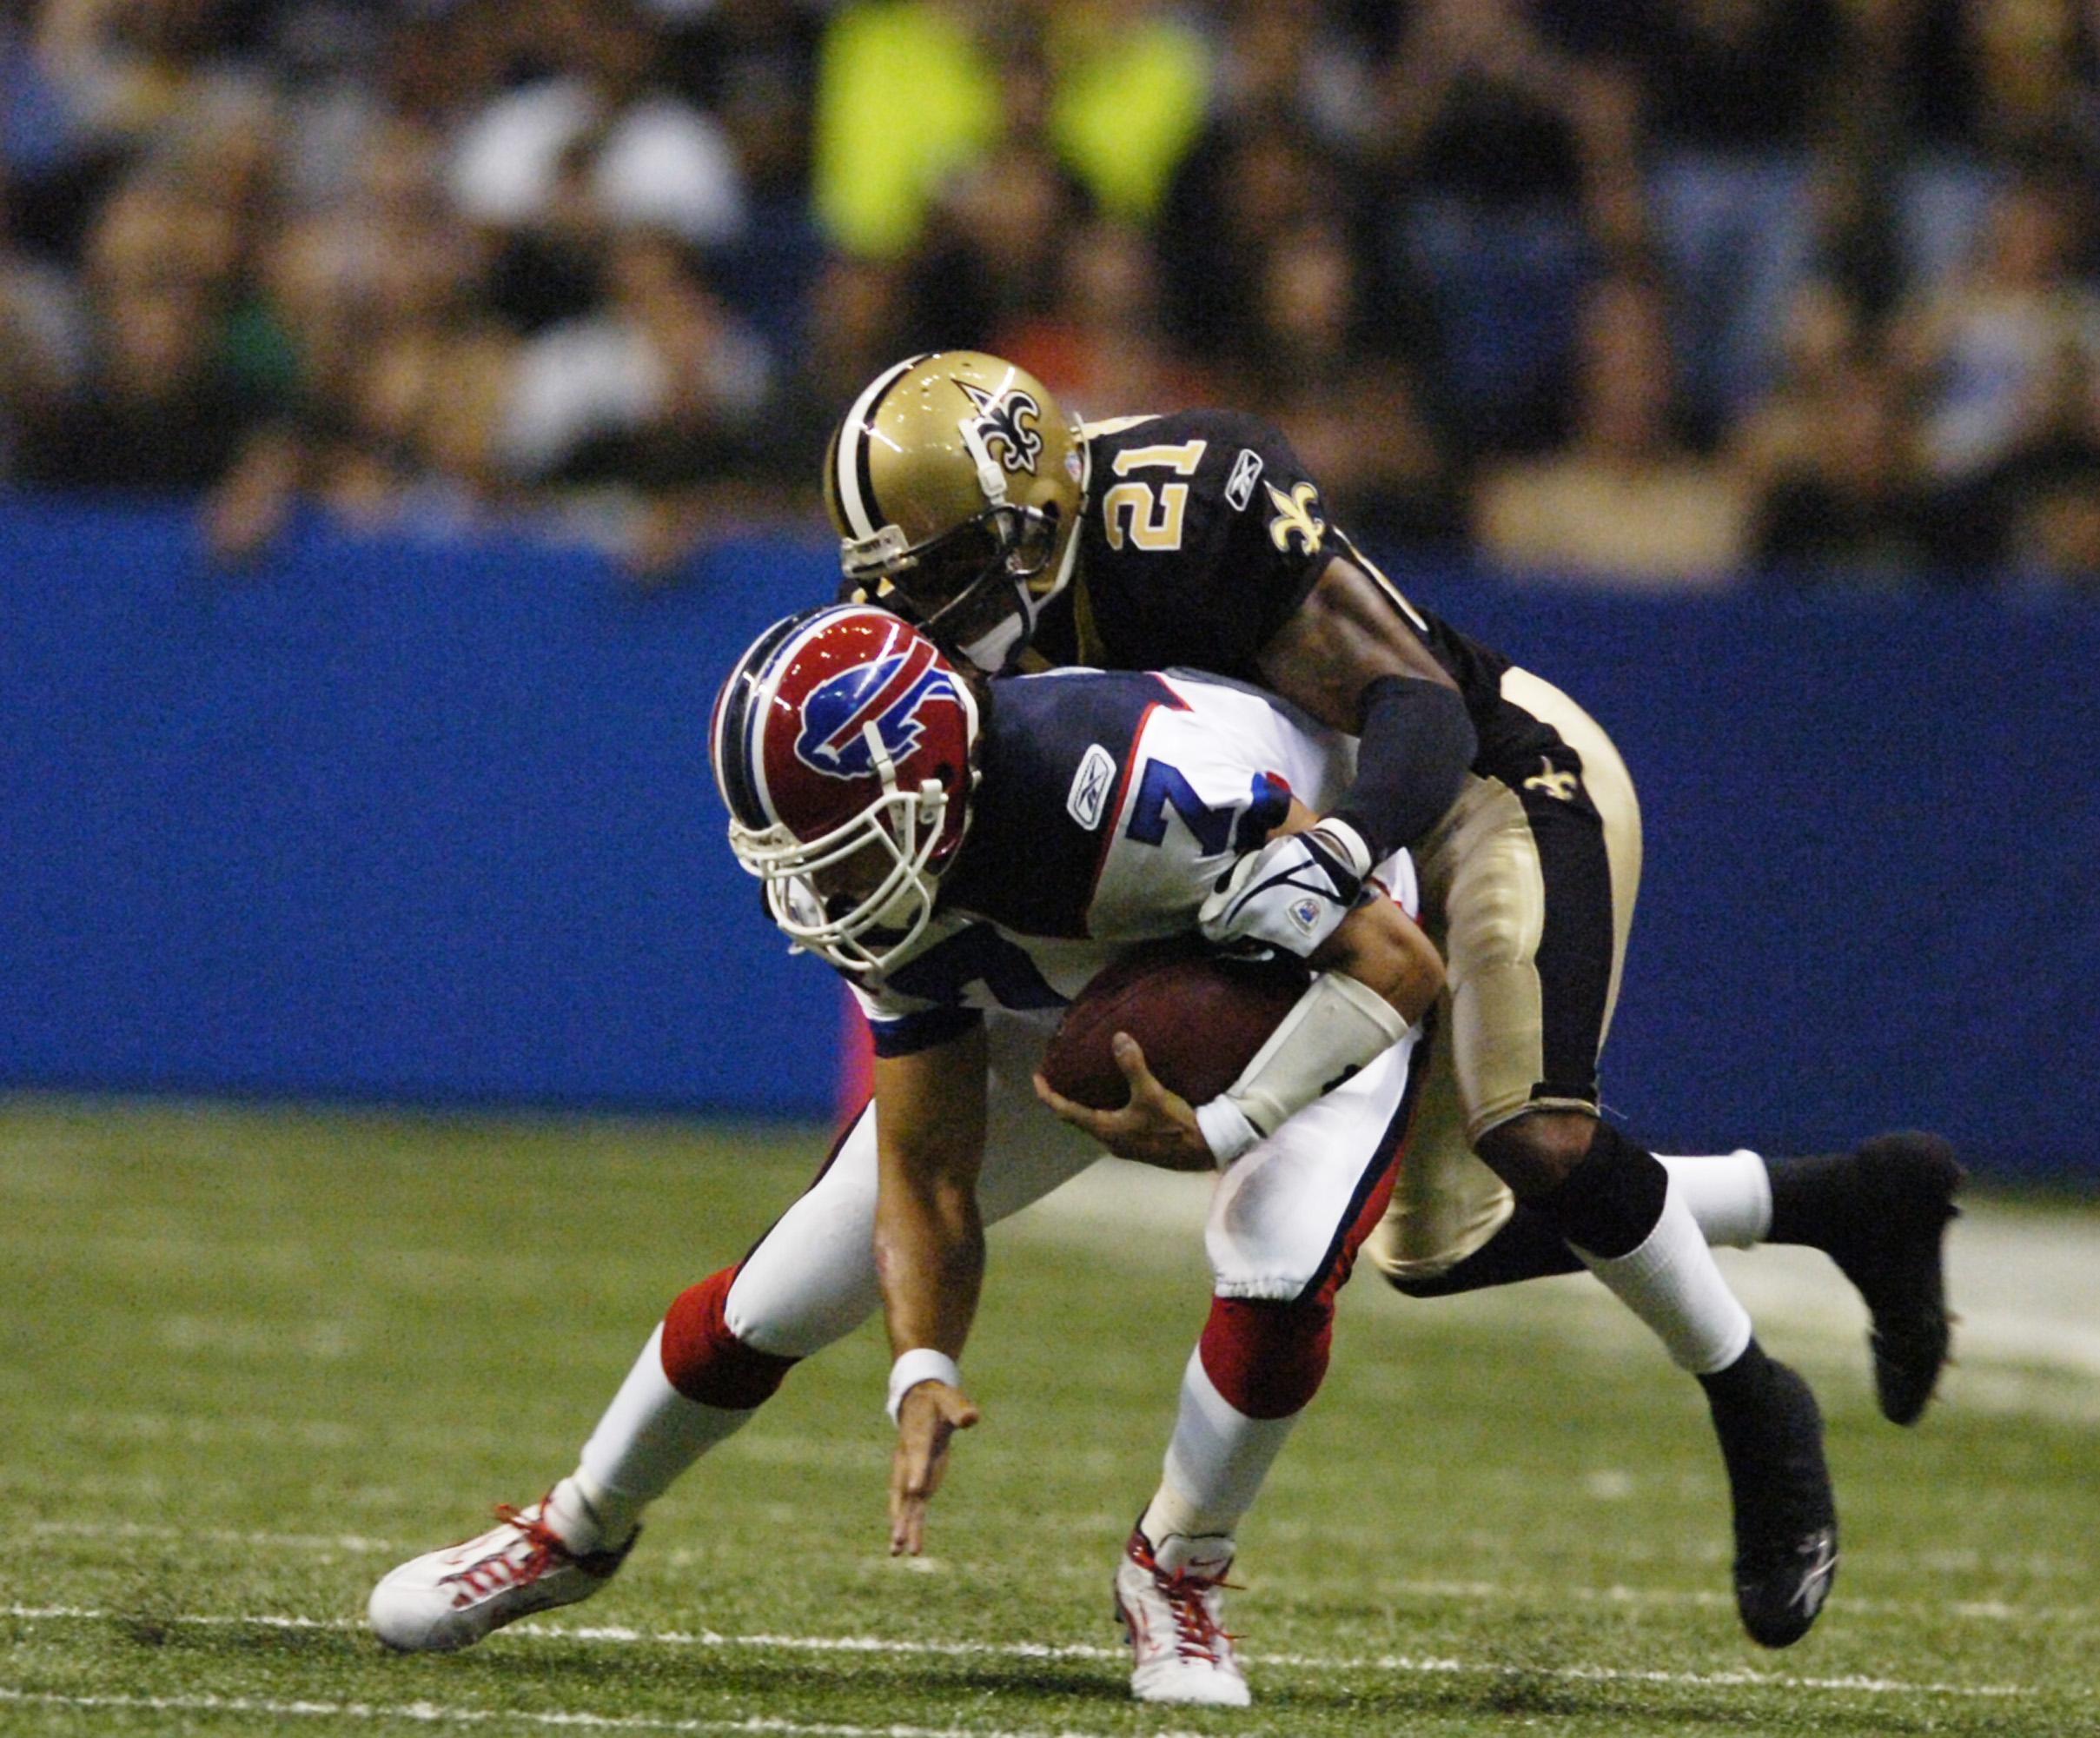 Buffalo Bills quarterback J.P. Losman is taken down by New Orleans' Jason Craft in an Oct. 2, 2005 game.  (News file photo/James P. McCoy)